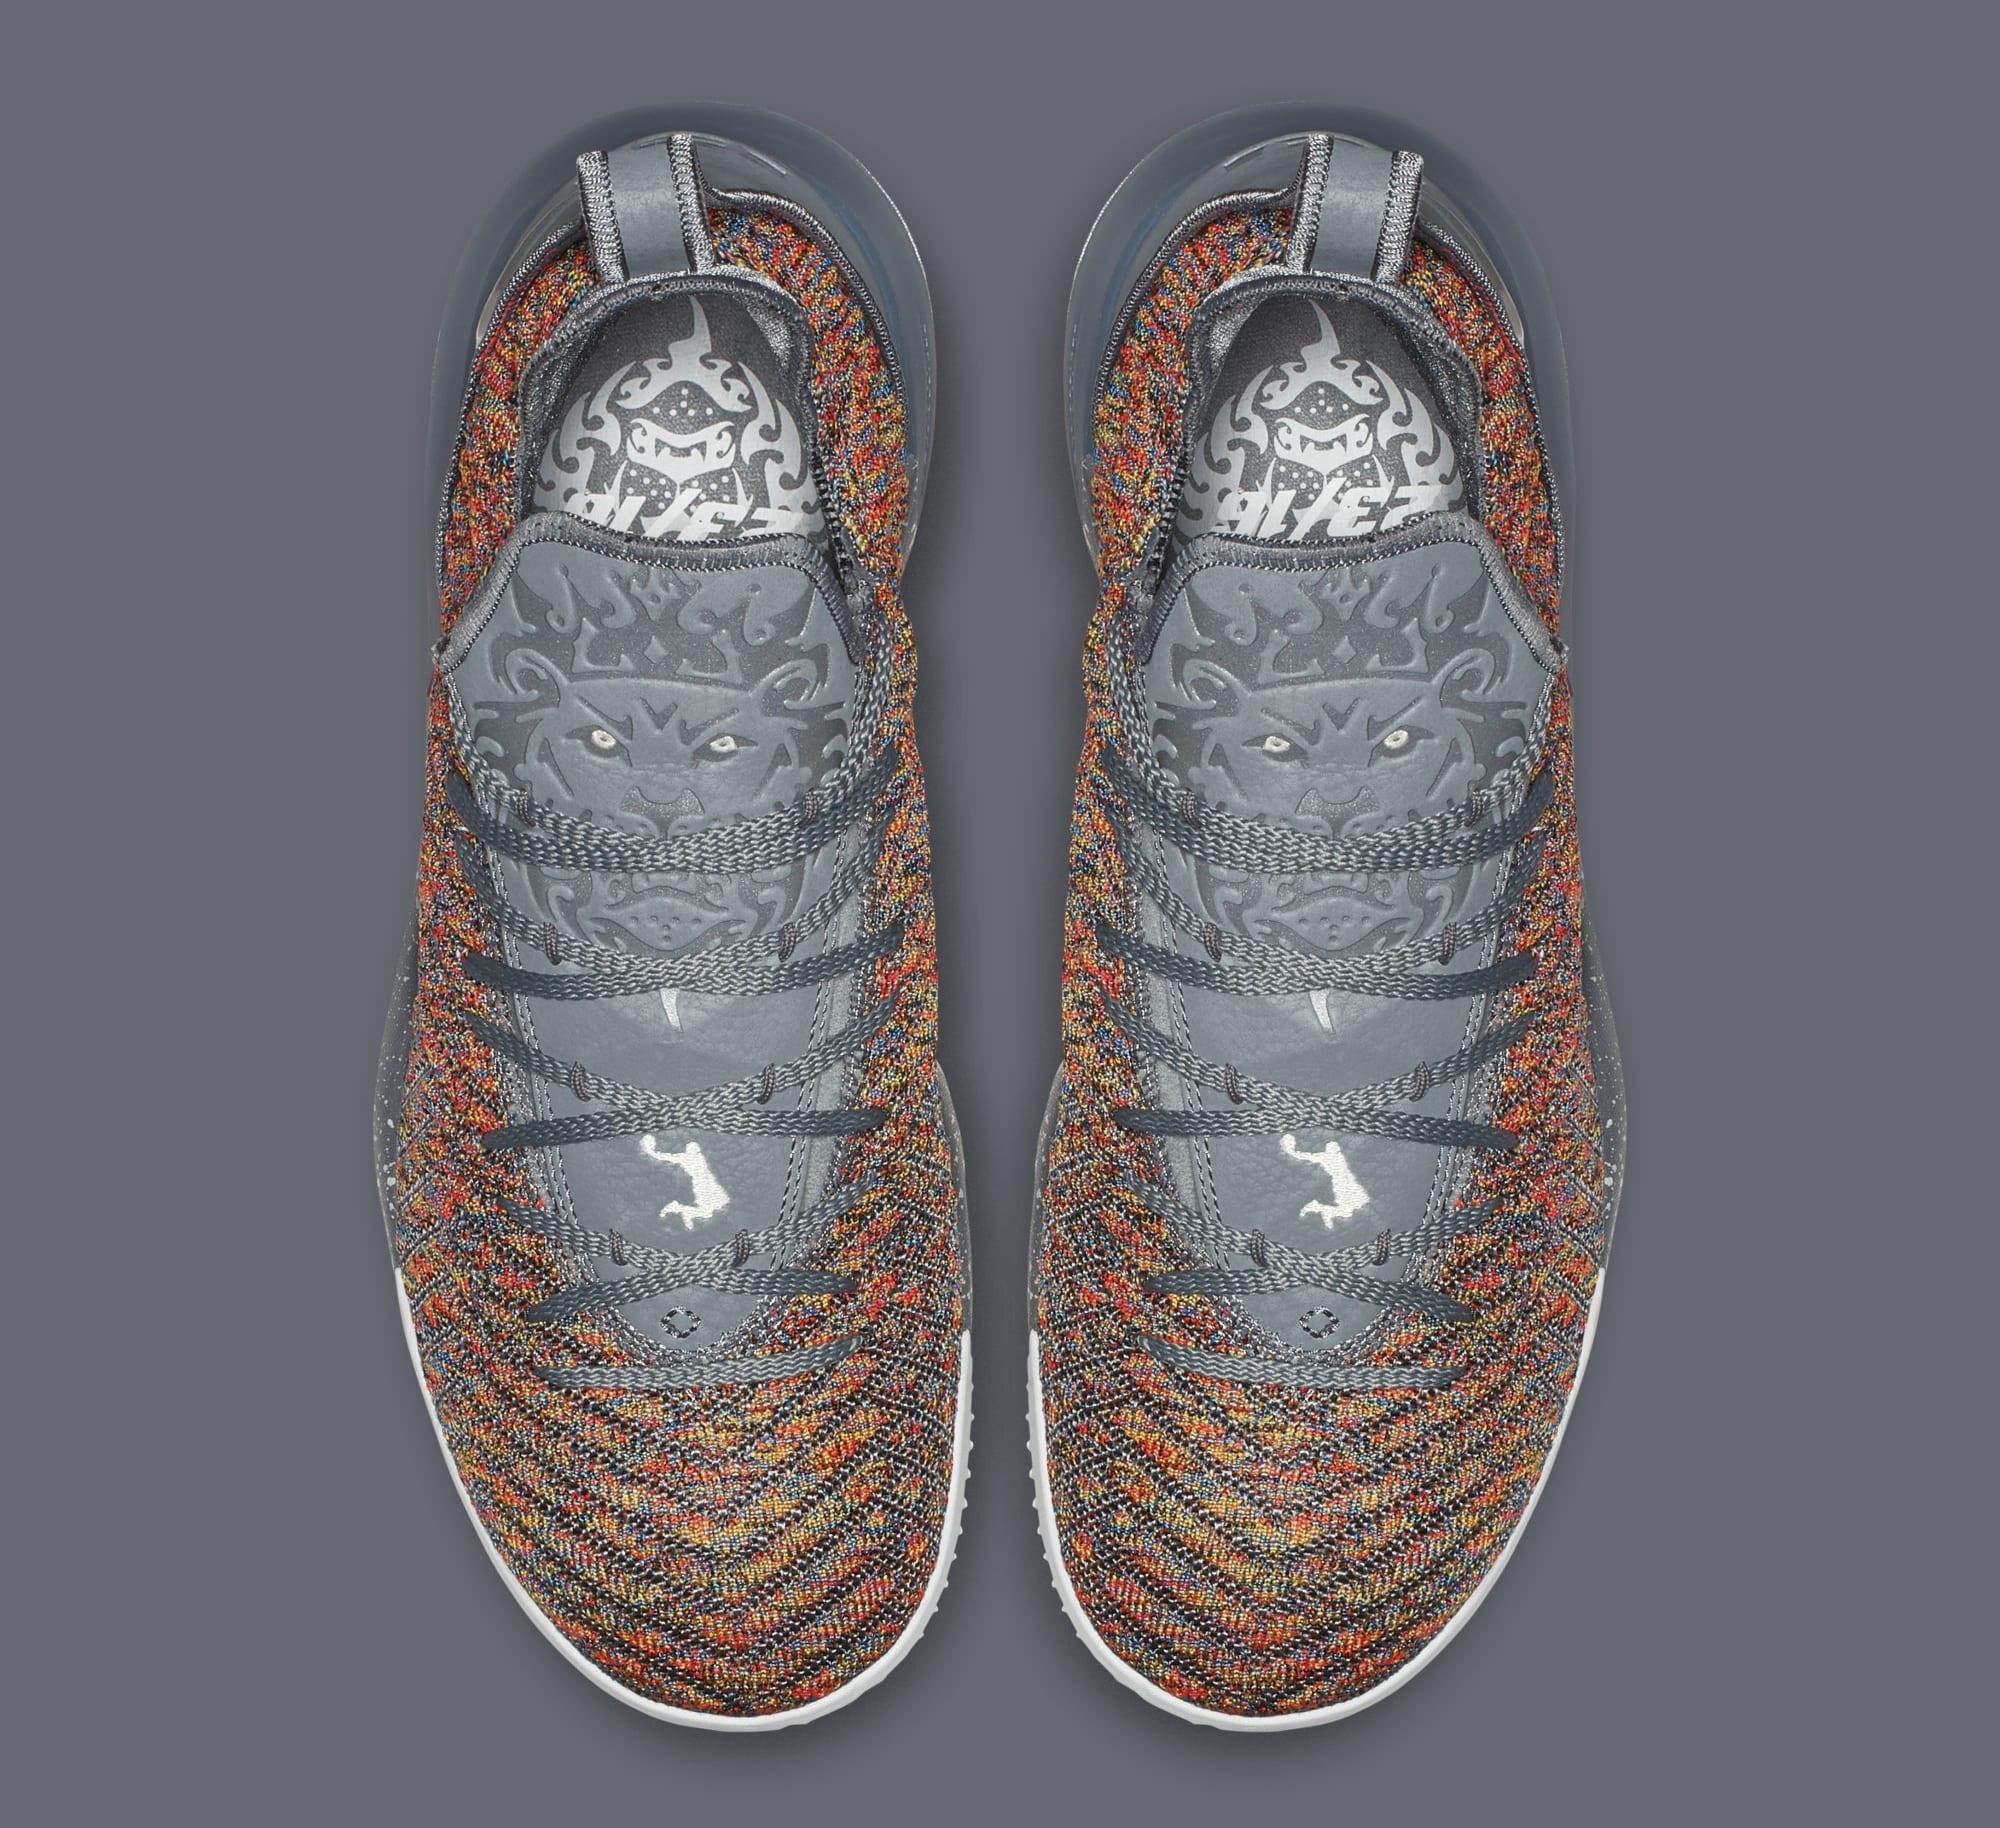 Nike LeBron 16 'Multicolor' BQ5969-900 (Top)